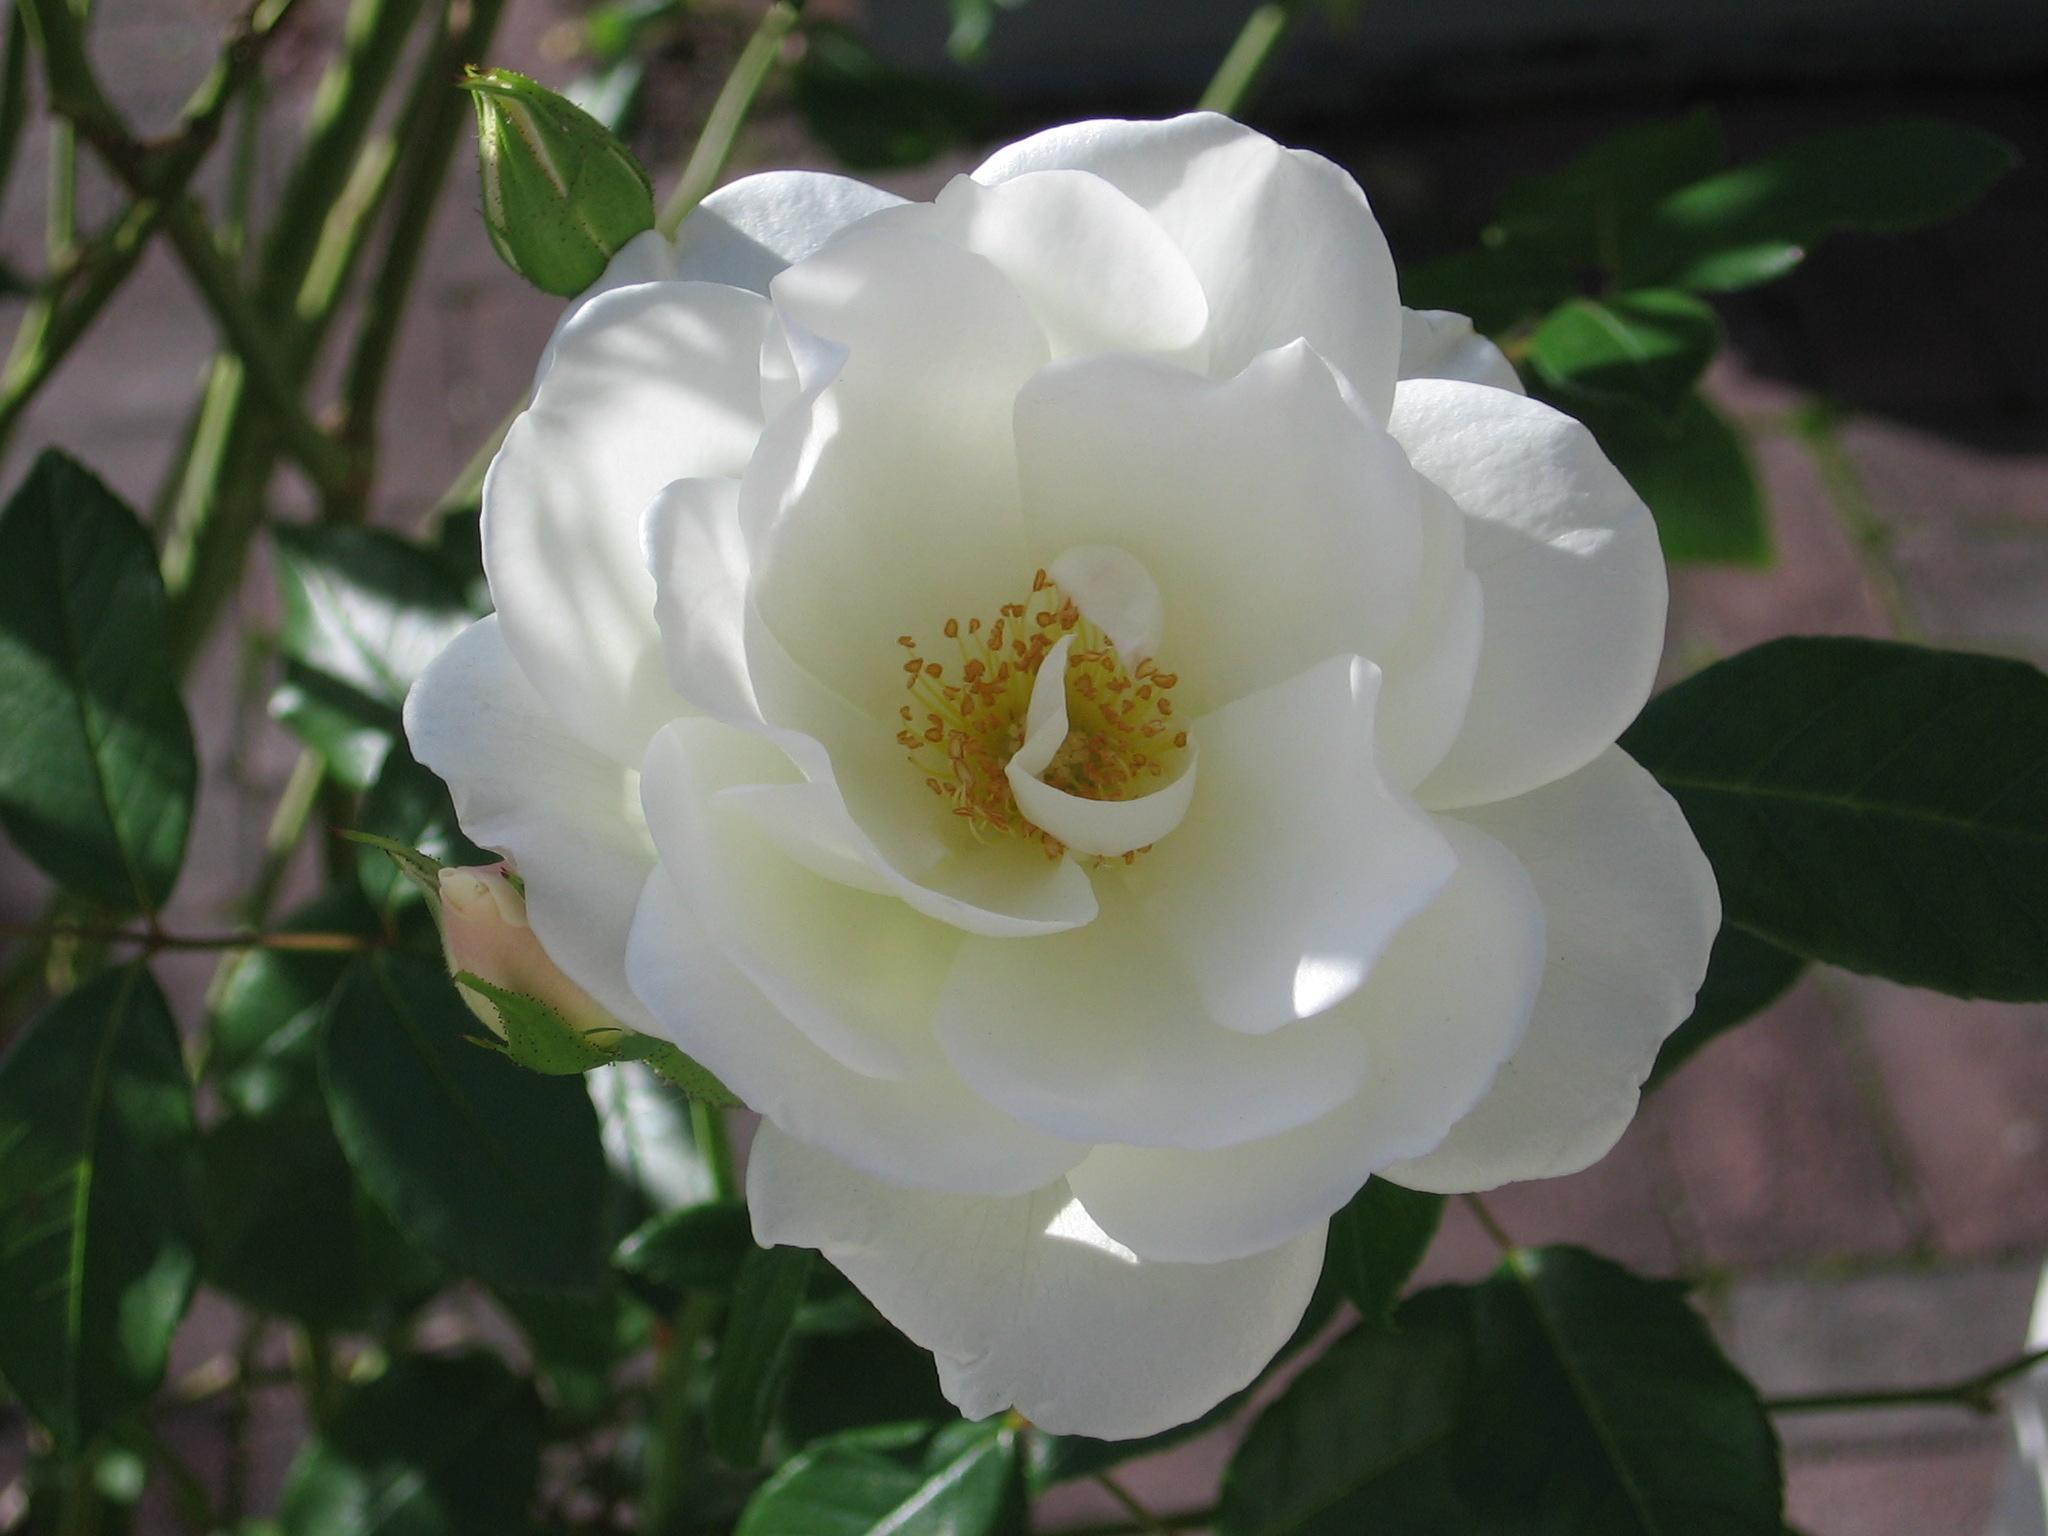 White flowers names 8 background wallpaper hdflowerwallpaper white flowers names free wallpaper mightylinksfo